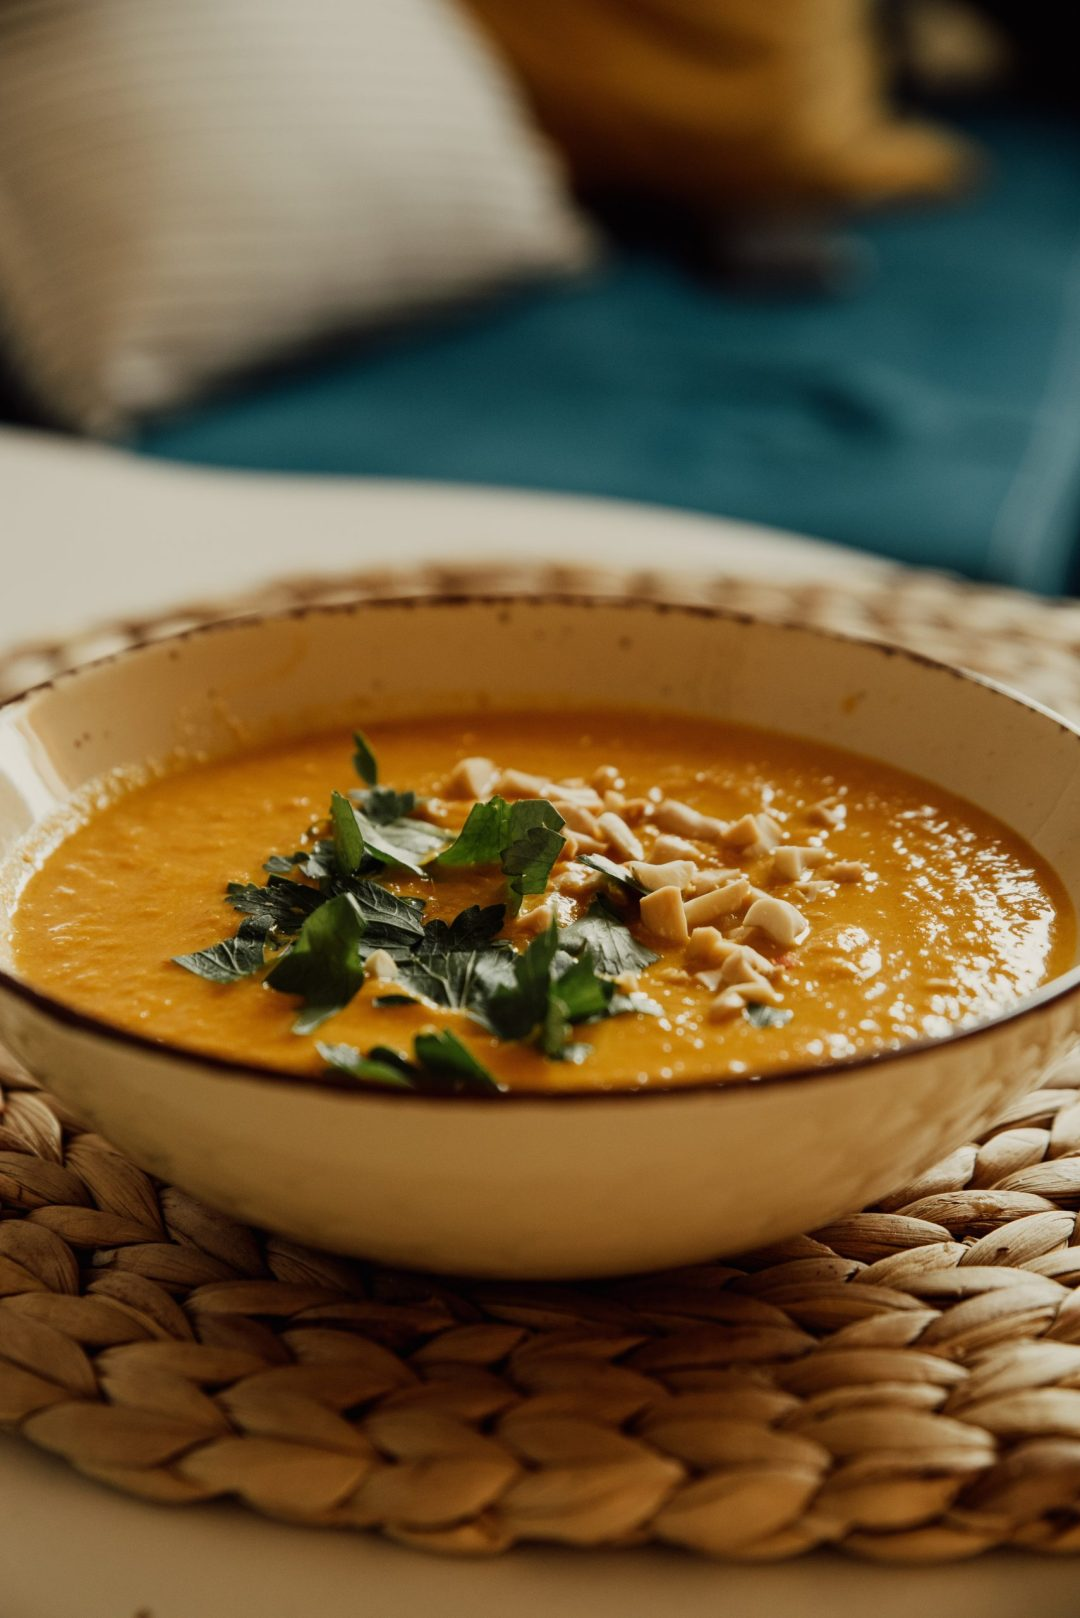 100 Best Fall Crockpot Recipes That Will Keep You Cozy & Warm